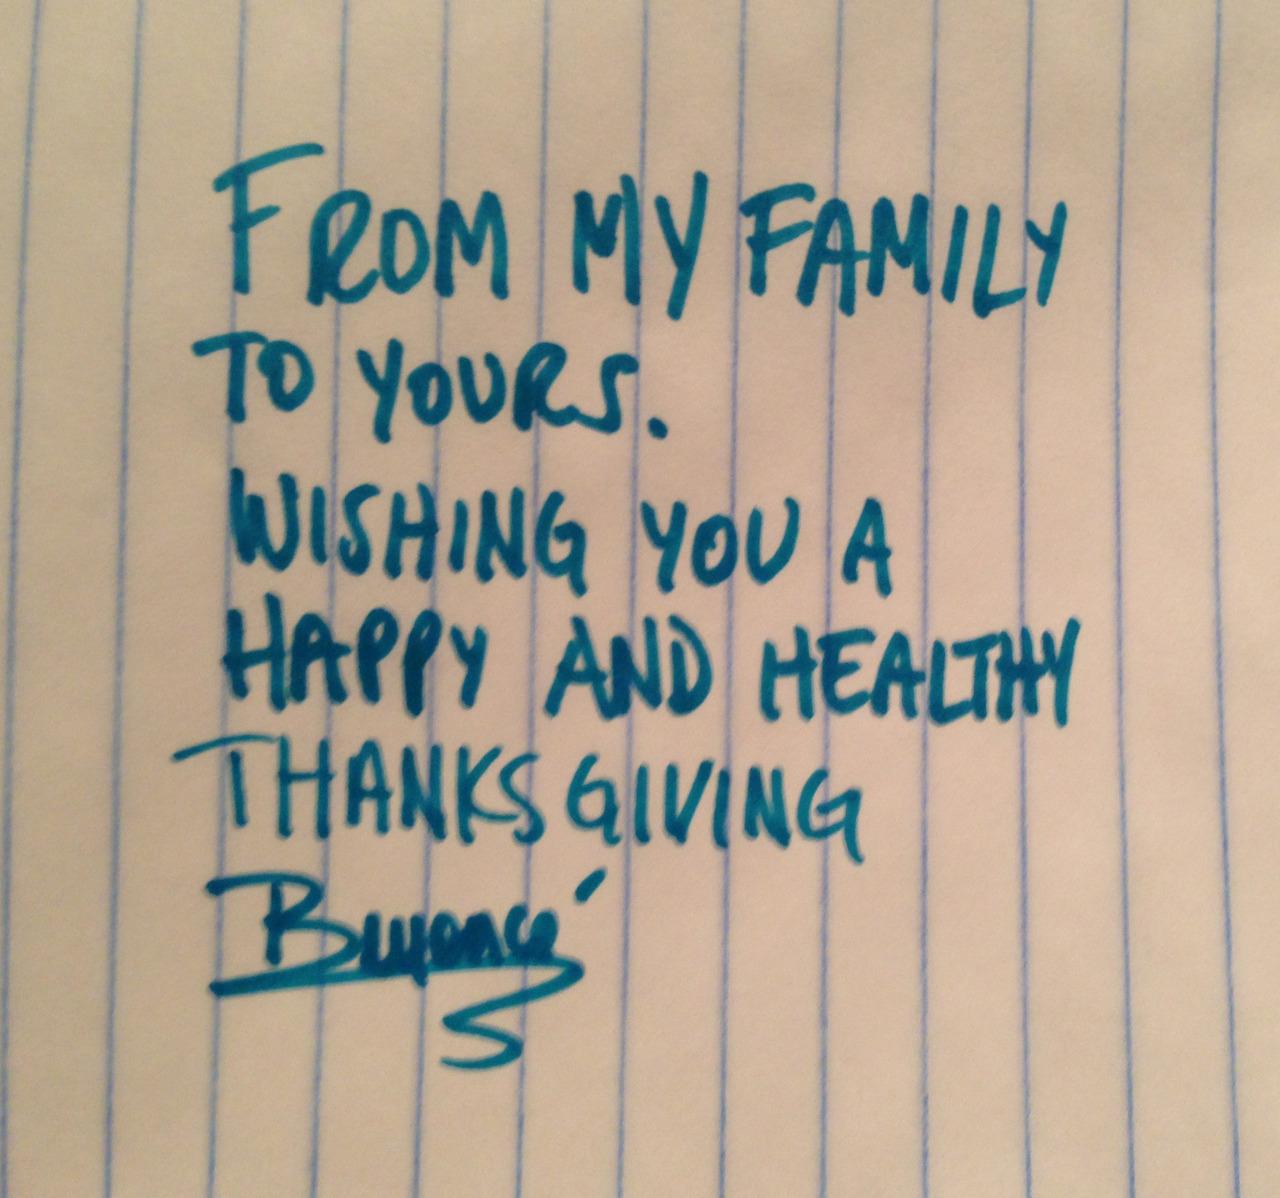 Beyoncé - Twitter (@Beyonce), Instagram (Baddiebey), Tumblr (I Am...) - Página 2 Tumblr_mdw9um74et1rqgjz2o1_1280